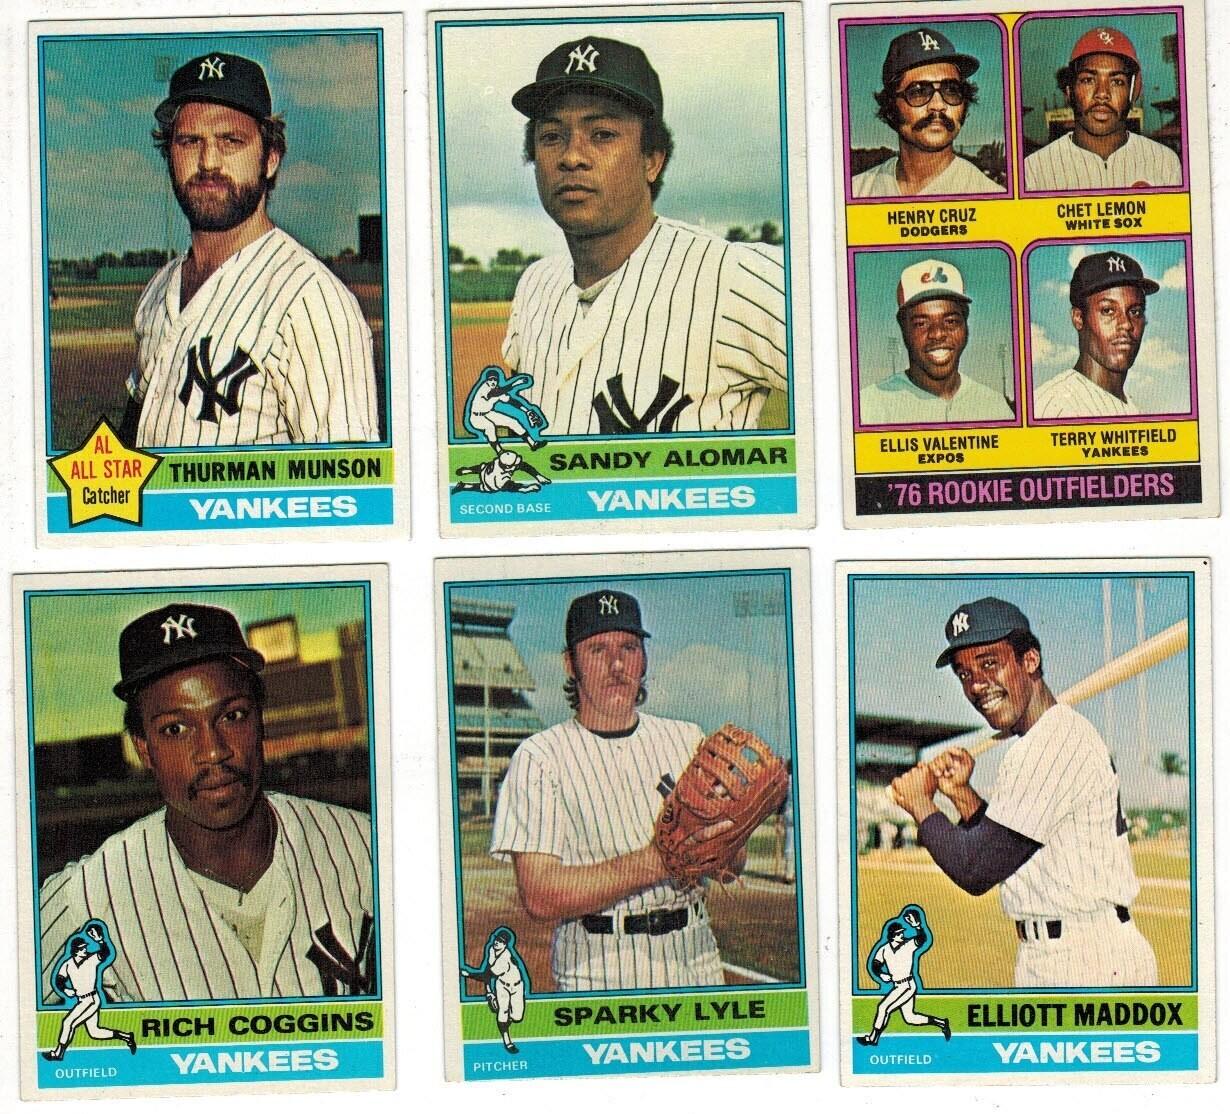 1976 Topps Yankee Team set 34 ct.